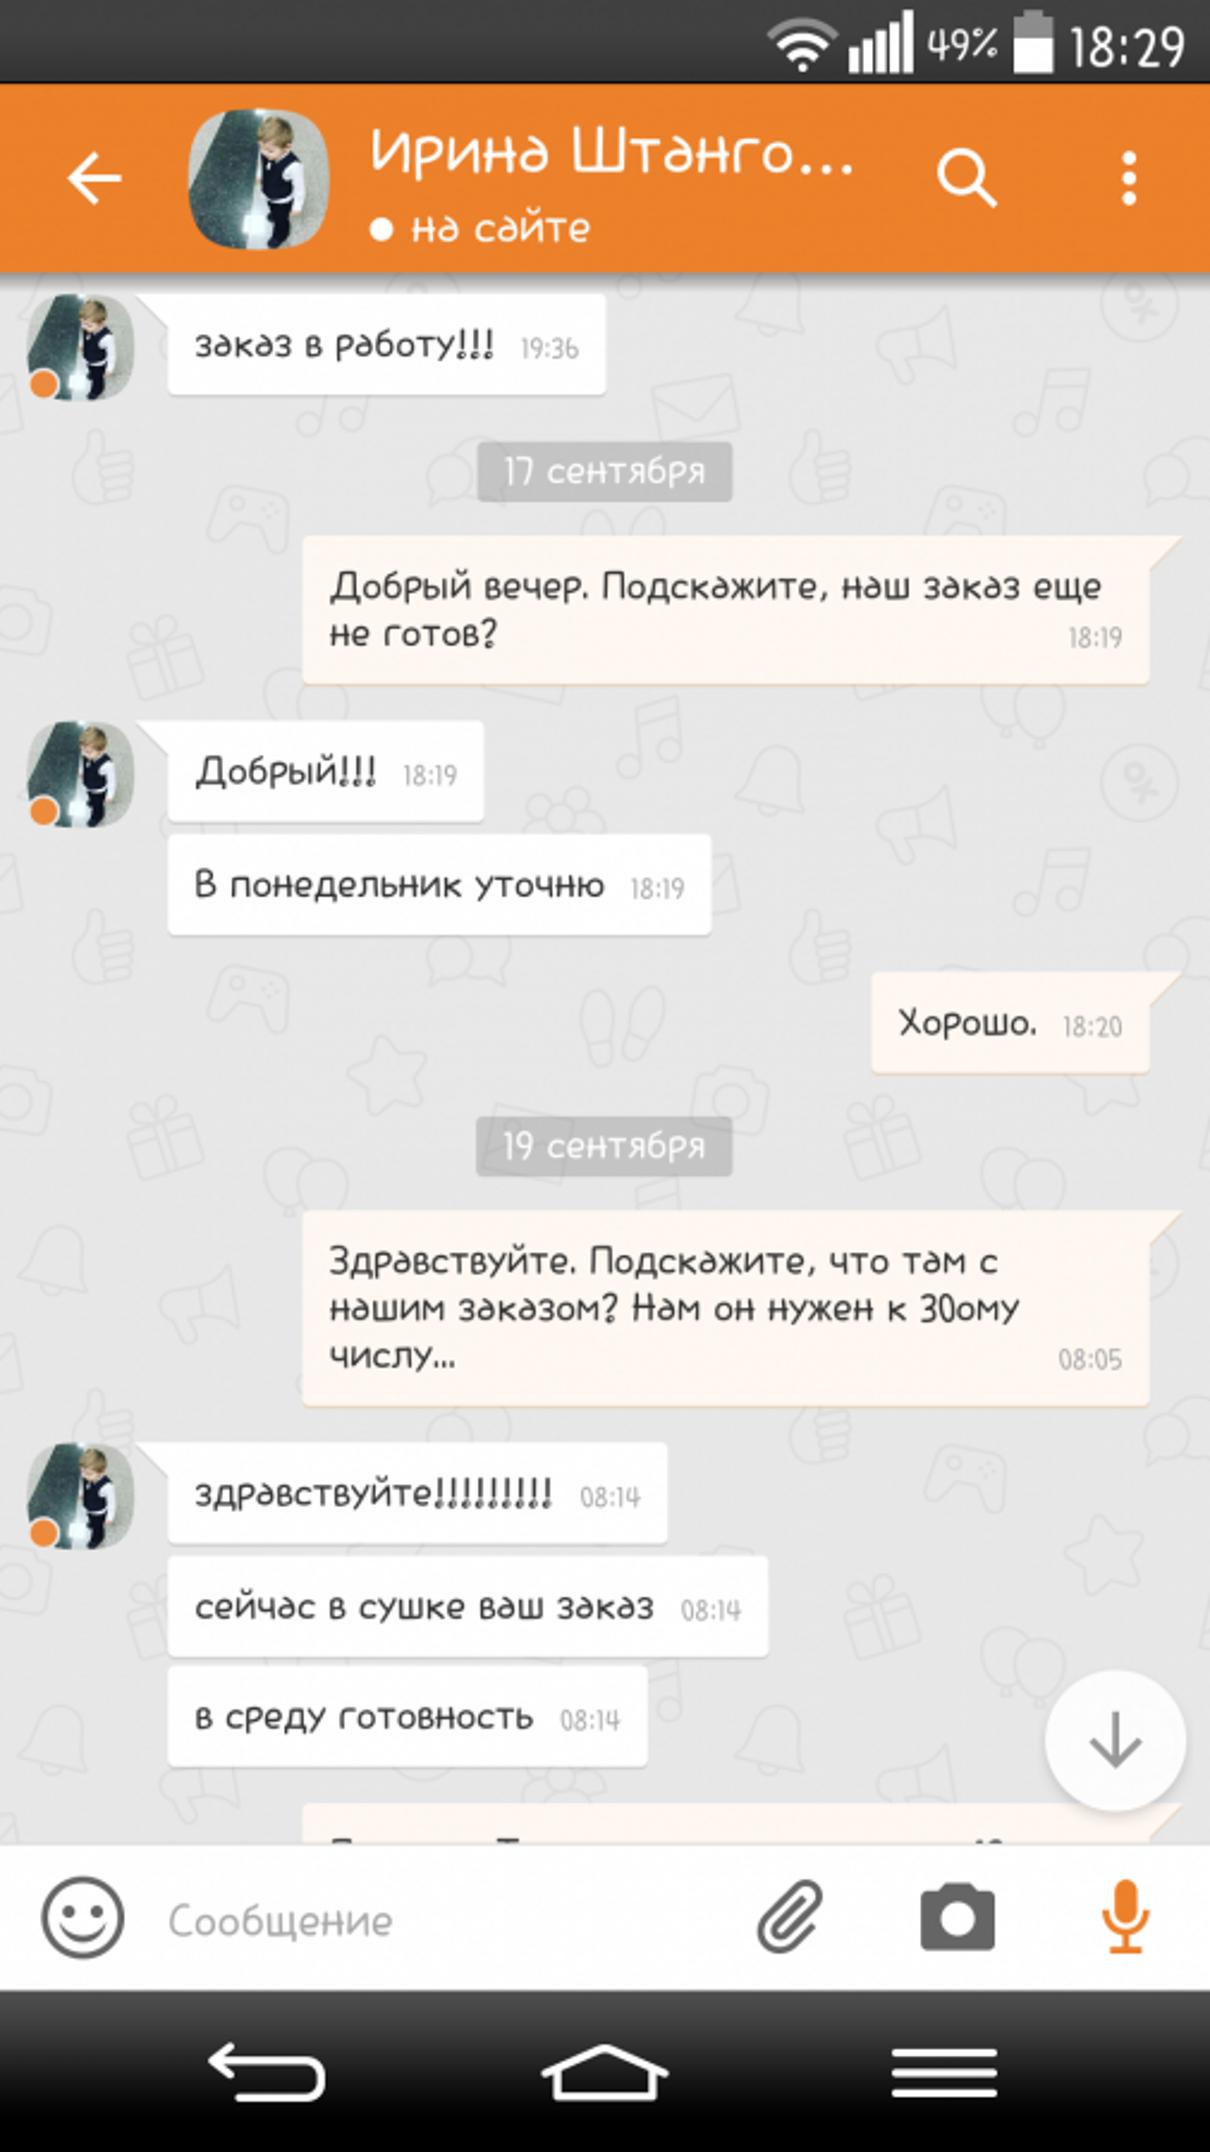 Жалоба-отзыв: Ирина Штанговец (Реброва) - Внимание хамка и хабалка!.  Фото №2